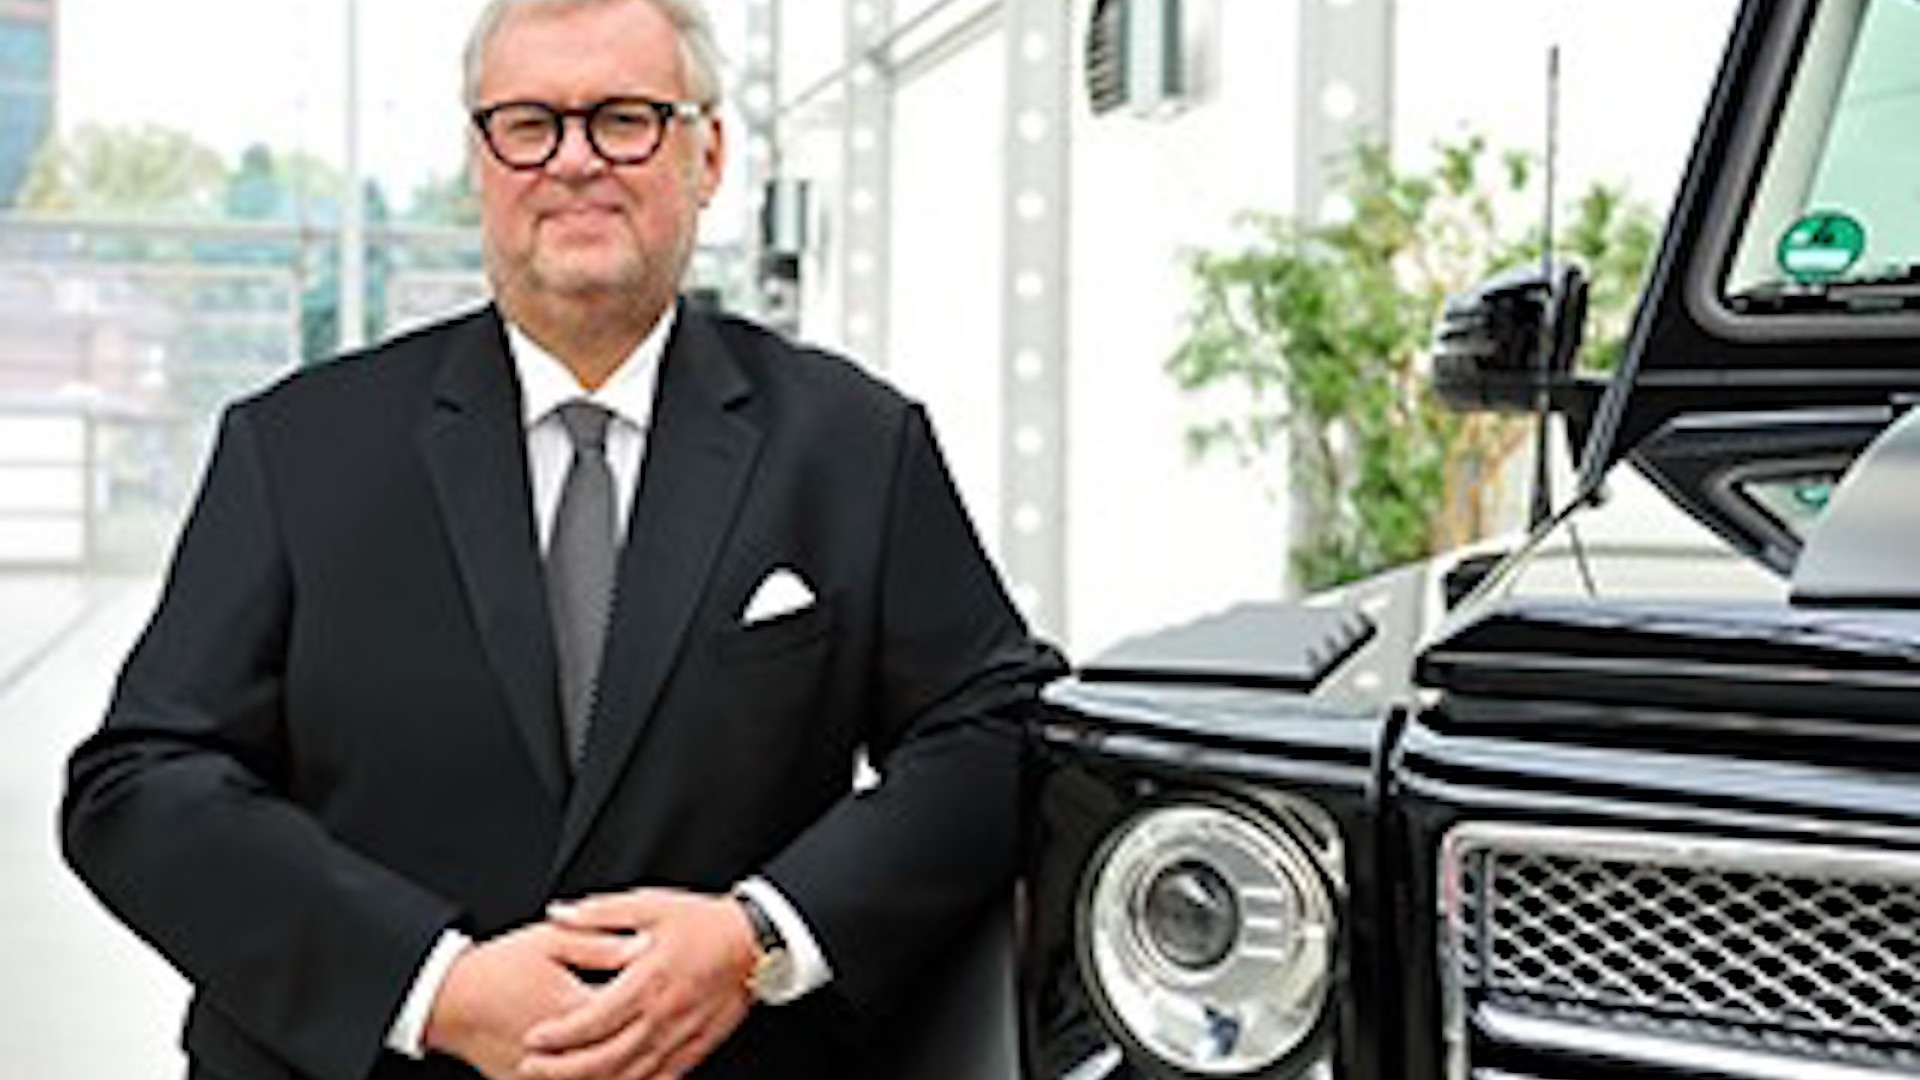 Brabus founder and CEO Bodo Buschmann